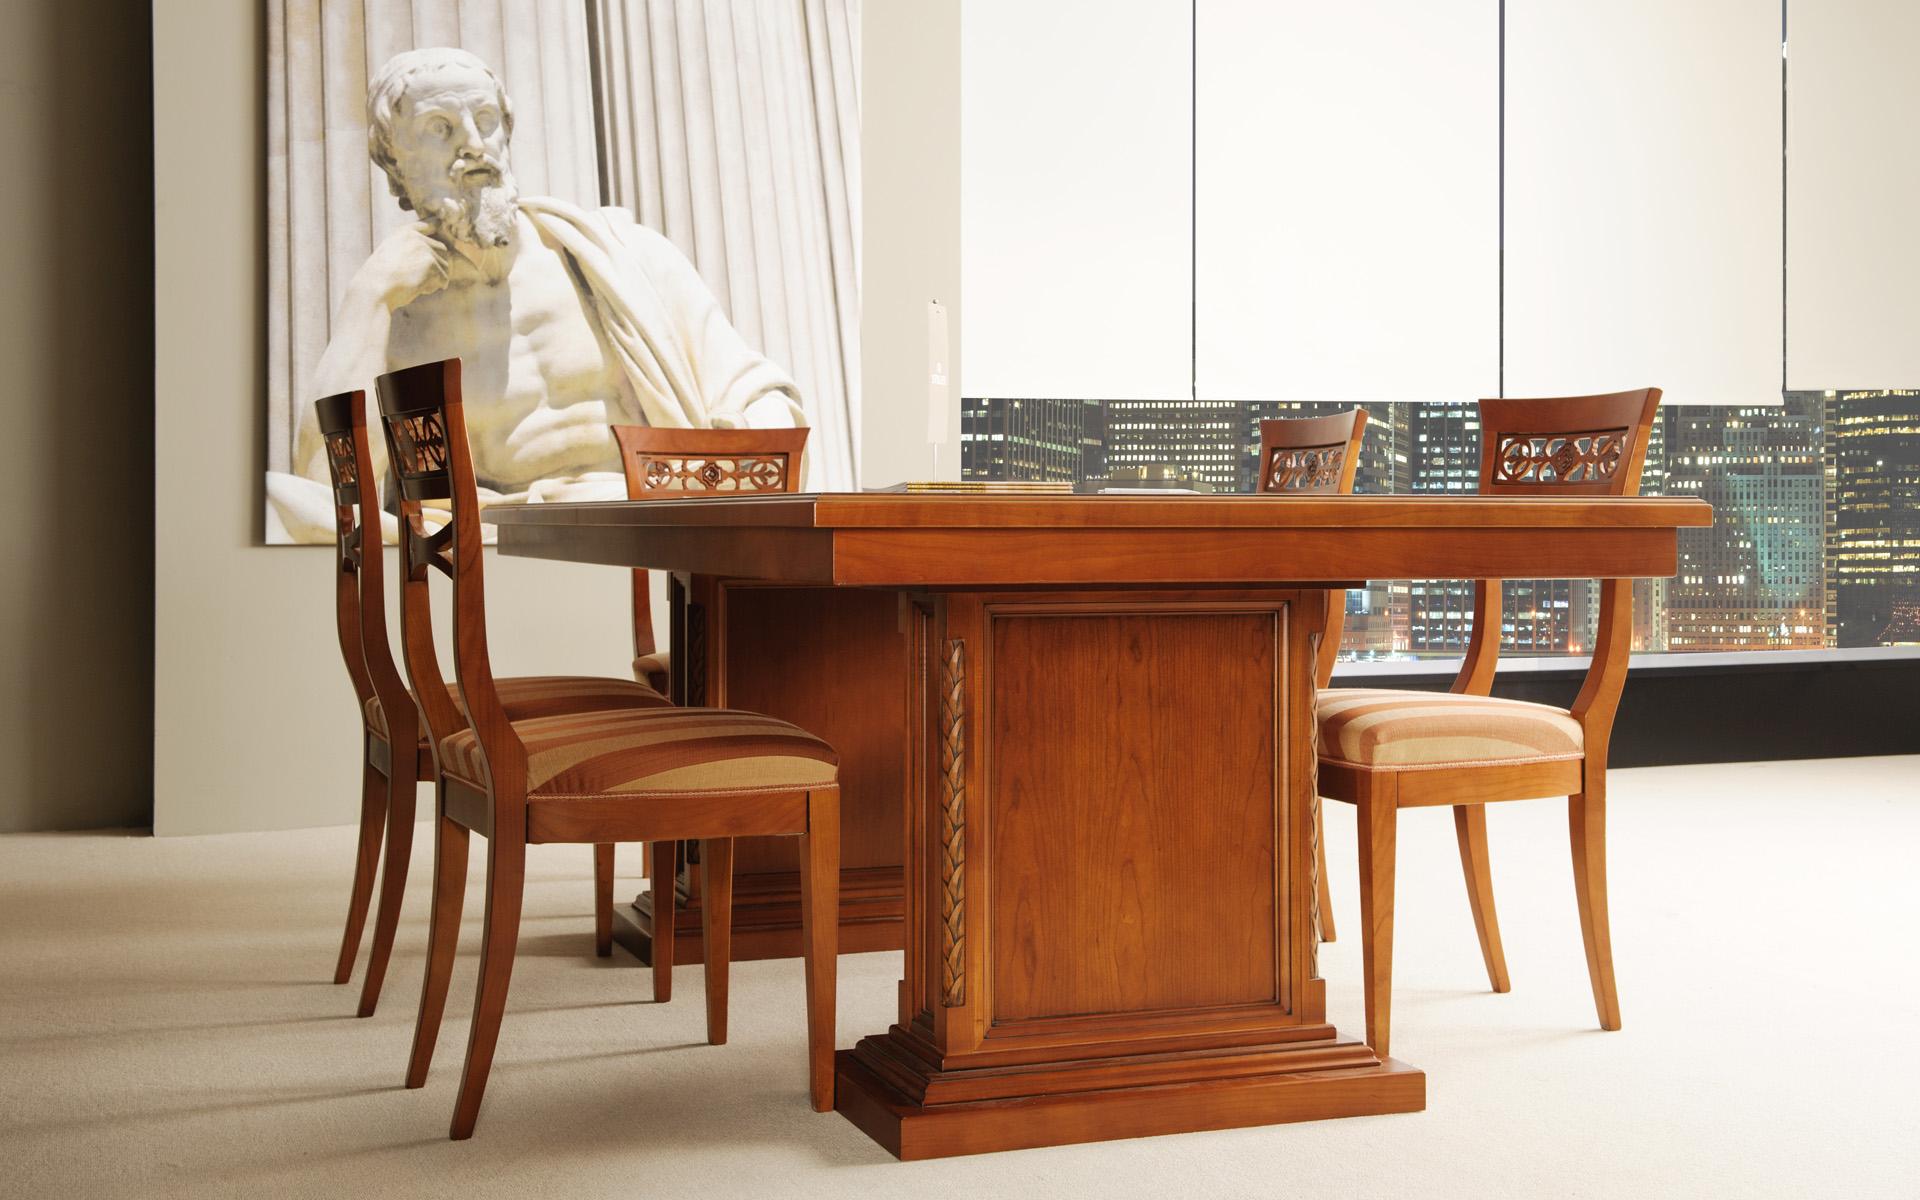 pisarna_office_Empire_klasicno-pohistvo_classic-furniture_Klassische-Moebel_5